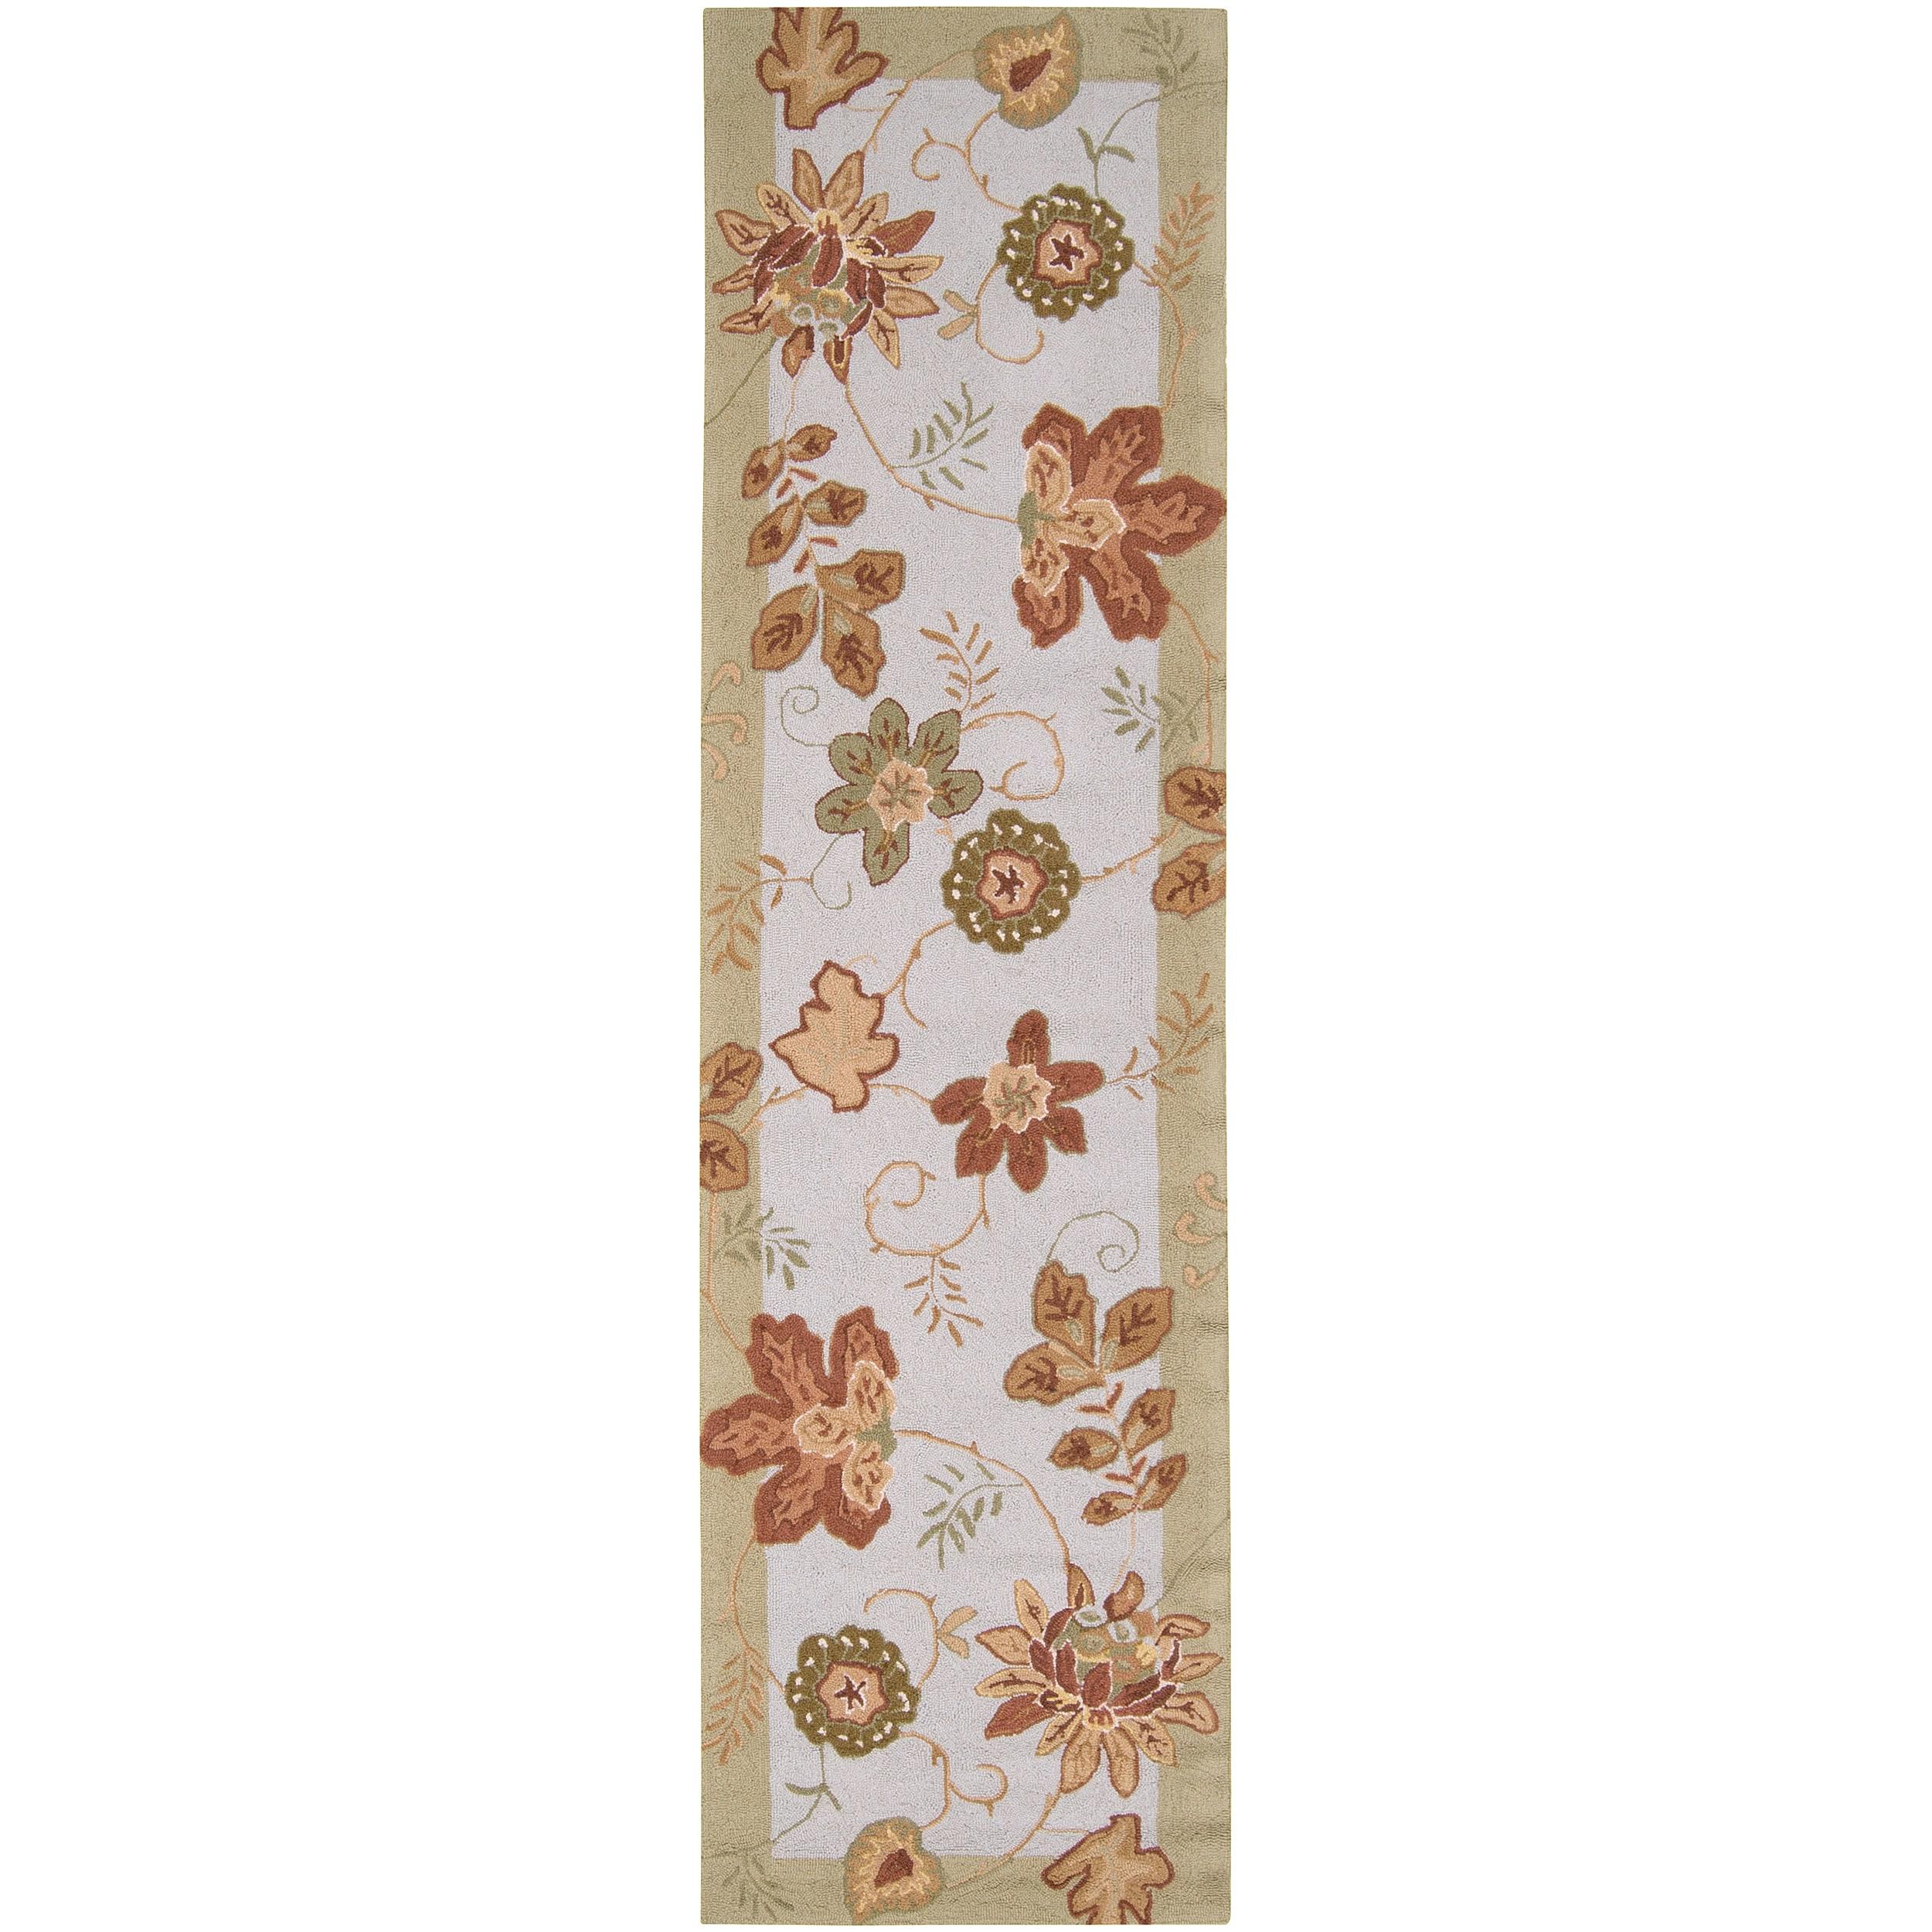 "Hand-Hooked Multicolored Grante Wool Runner Rug (2'6"" x 4')"